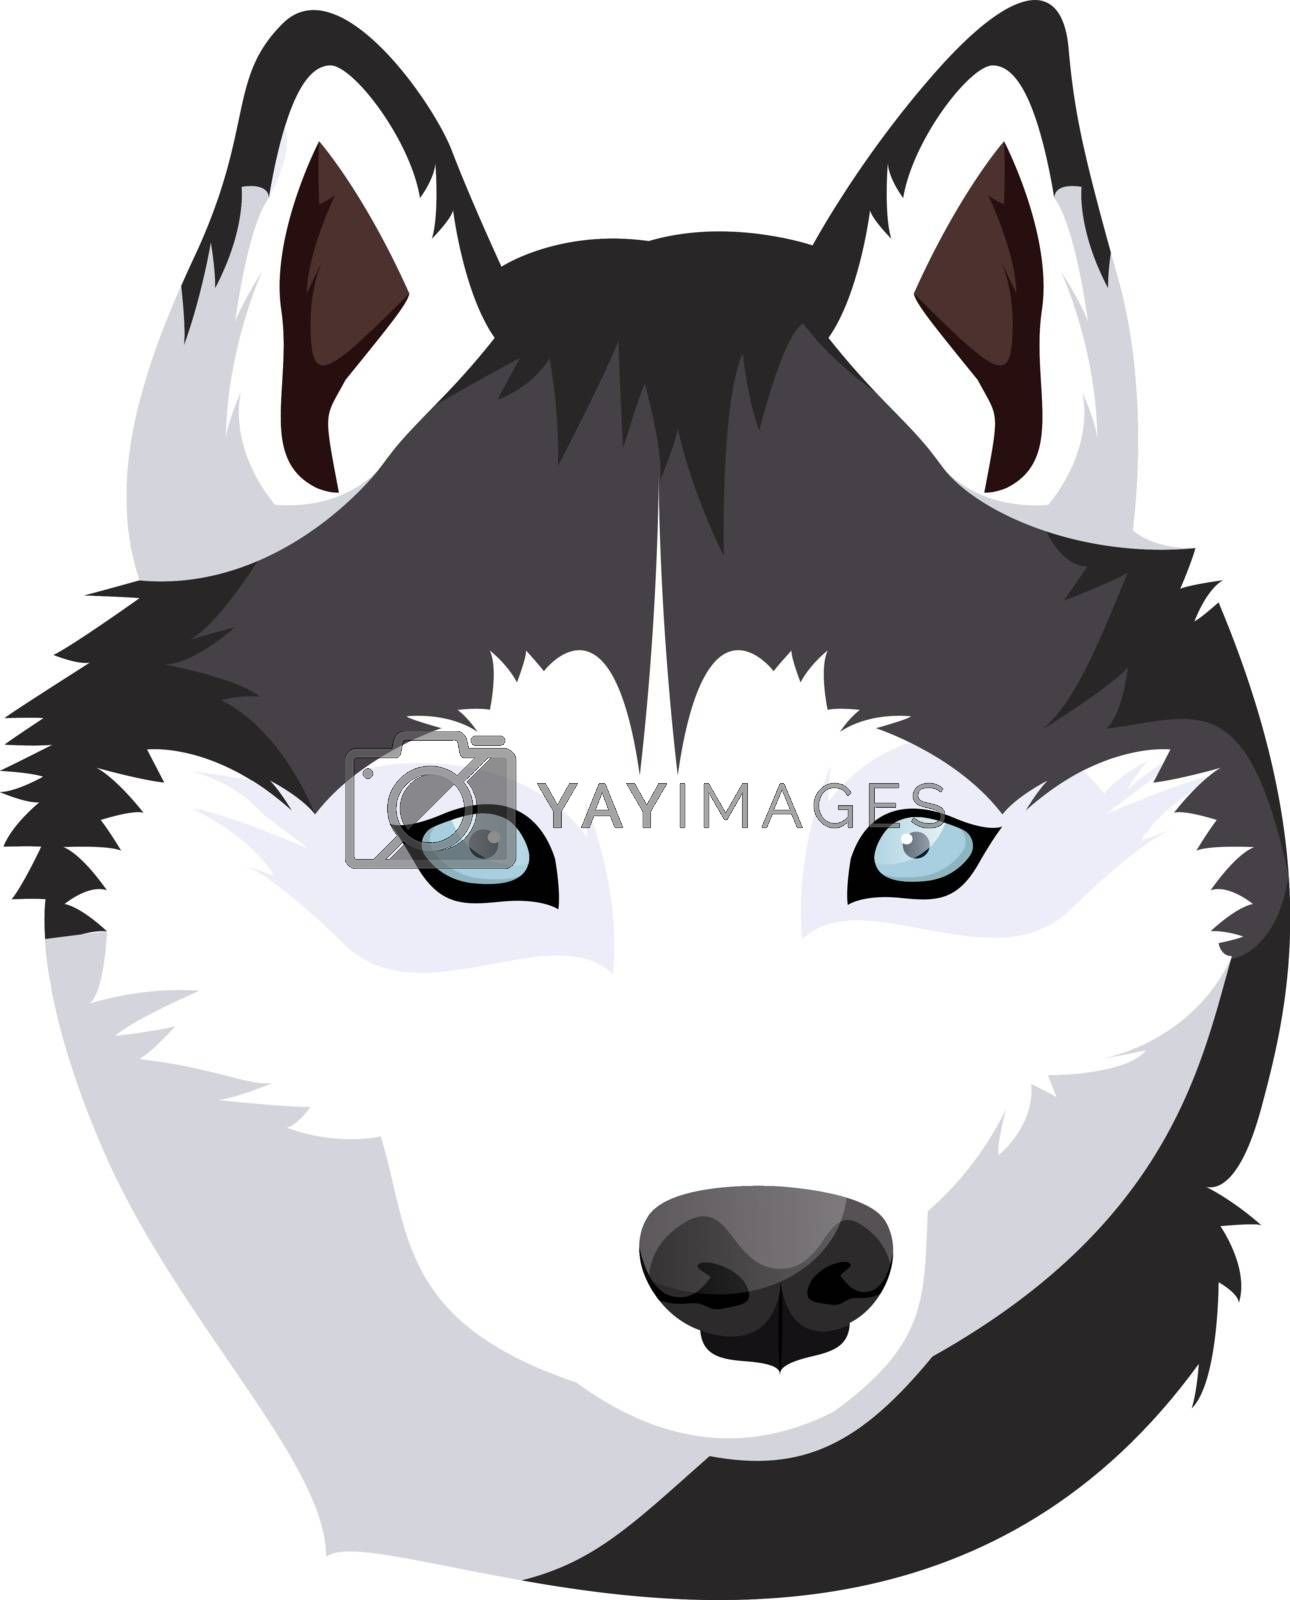 Royalty free image of Siberian Husky illustration vector on white background by Morphart